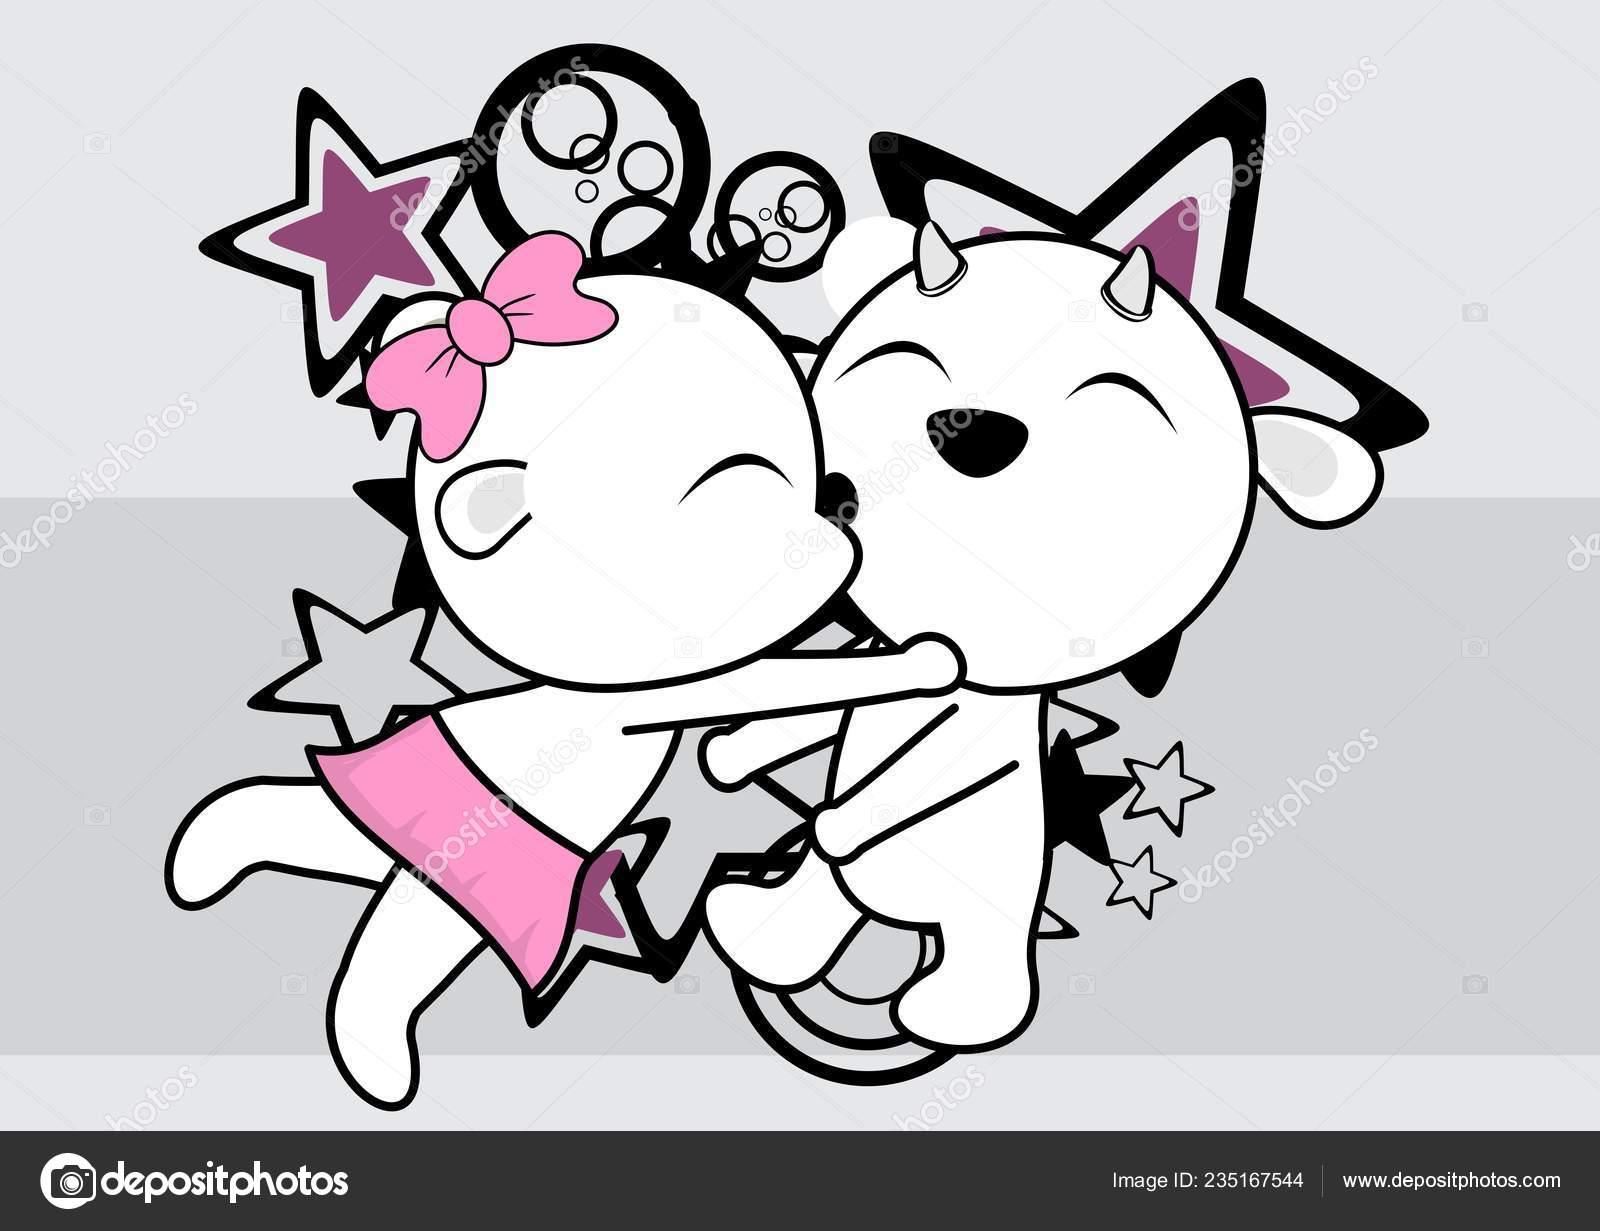 Kawaii Mignon Chèvre Couple Dessin Animé Saint Valentin